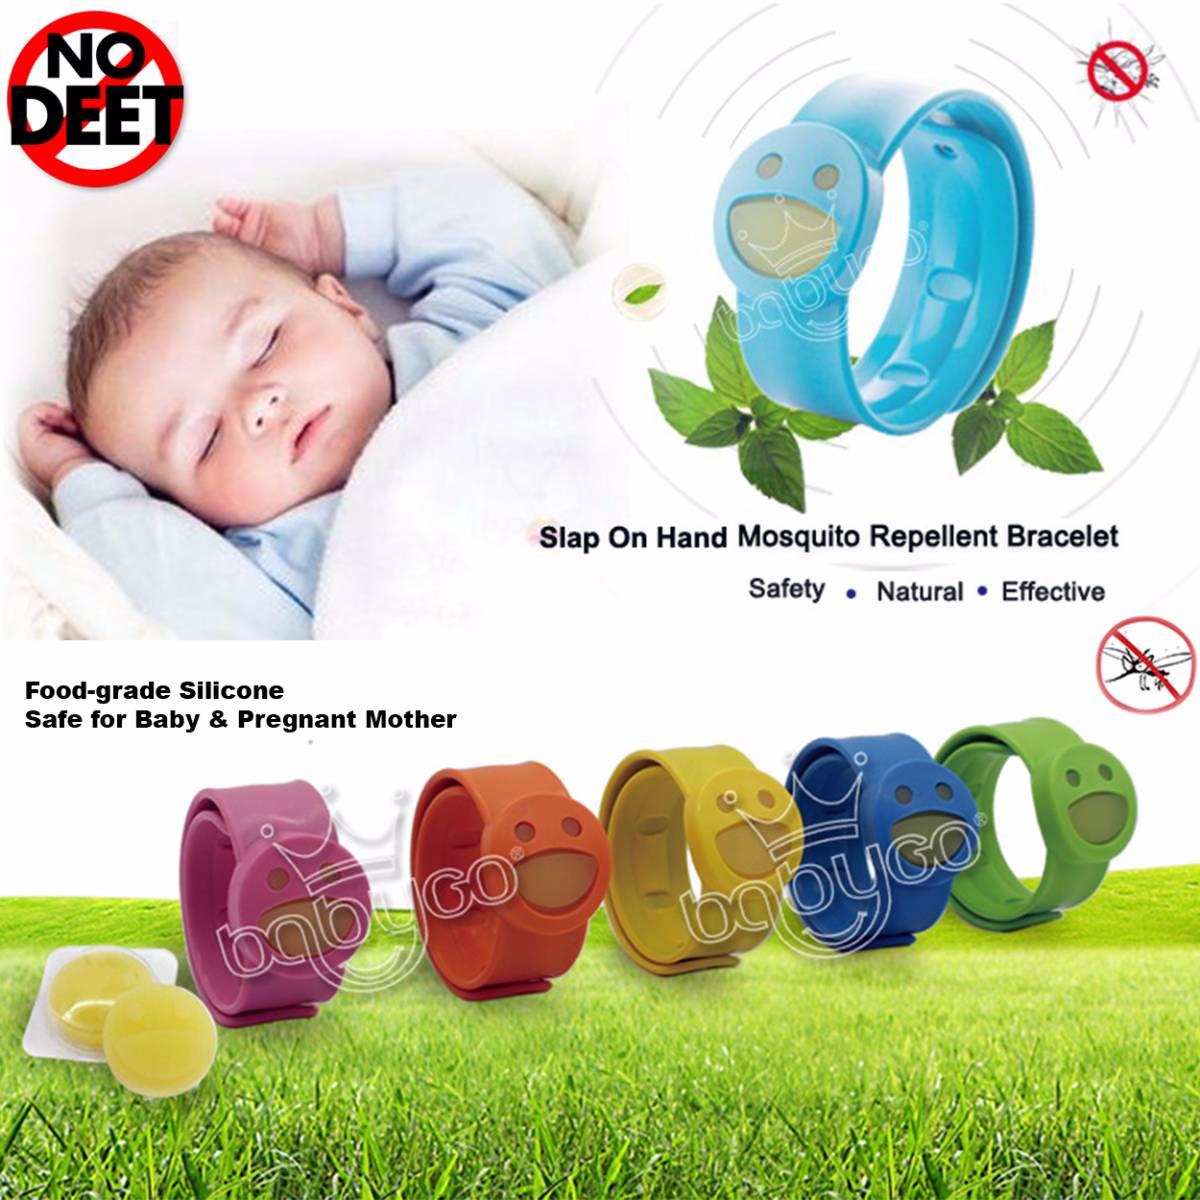 Babygo Slap Mosquito Repellent Bracelet Orange (gelang Anti Nyamuk Anak)4